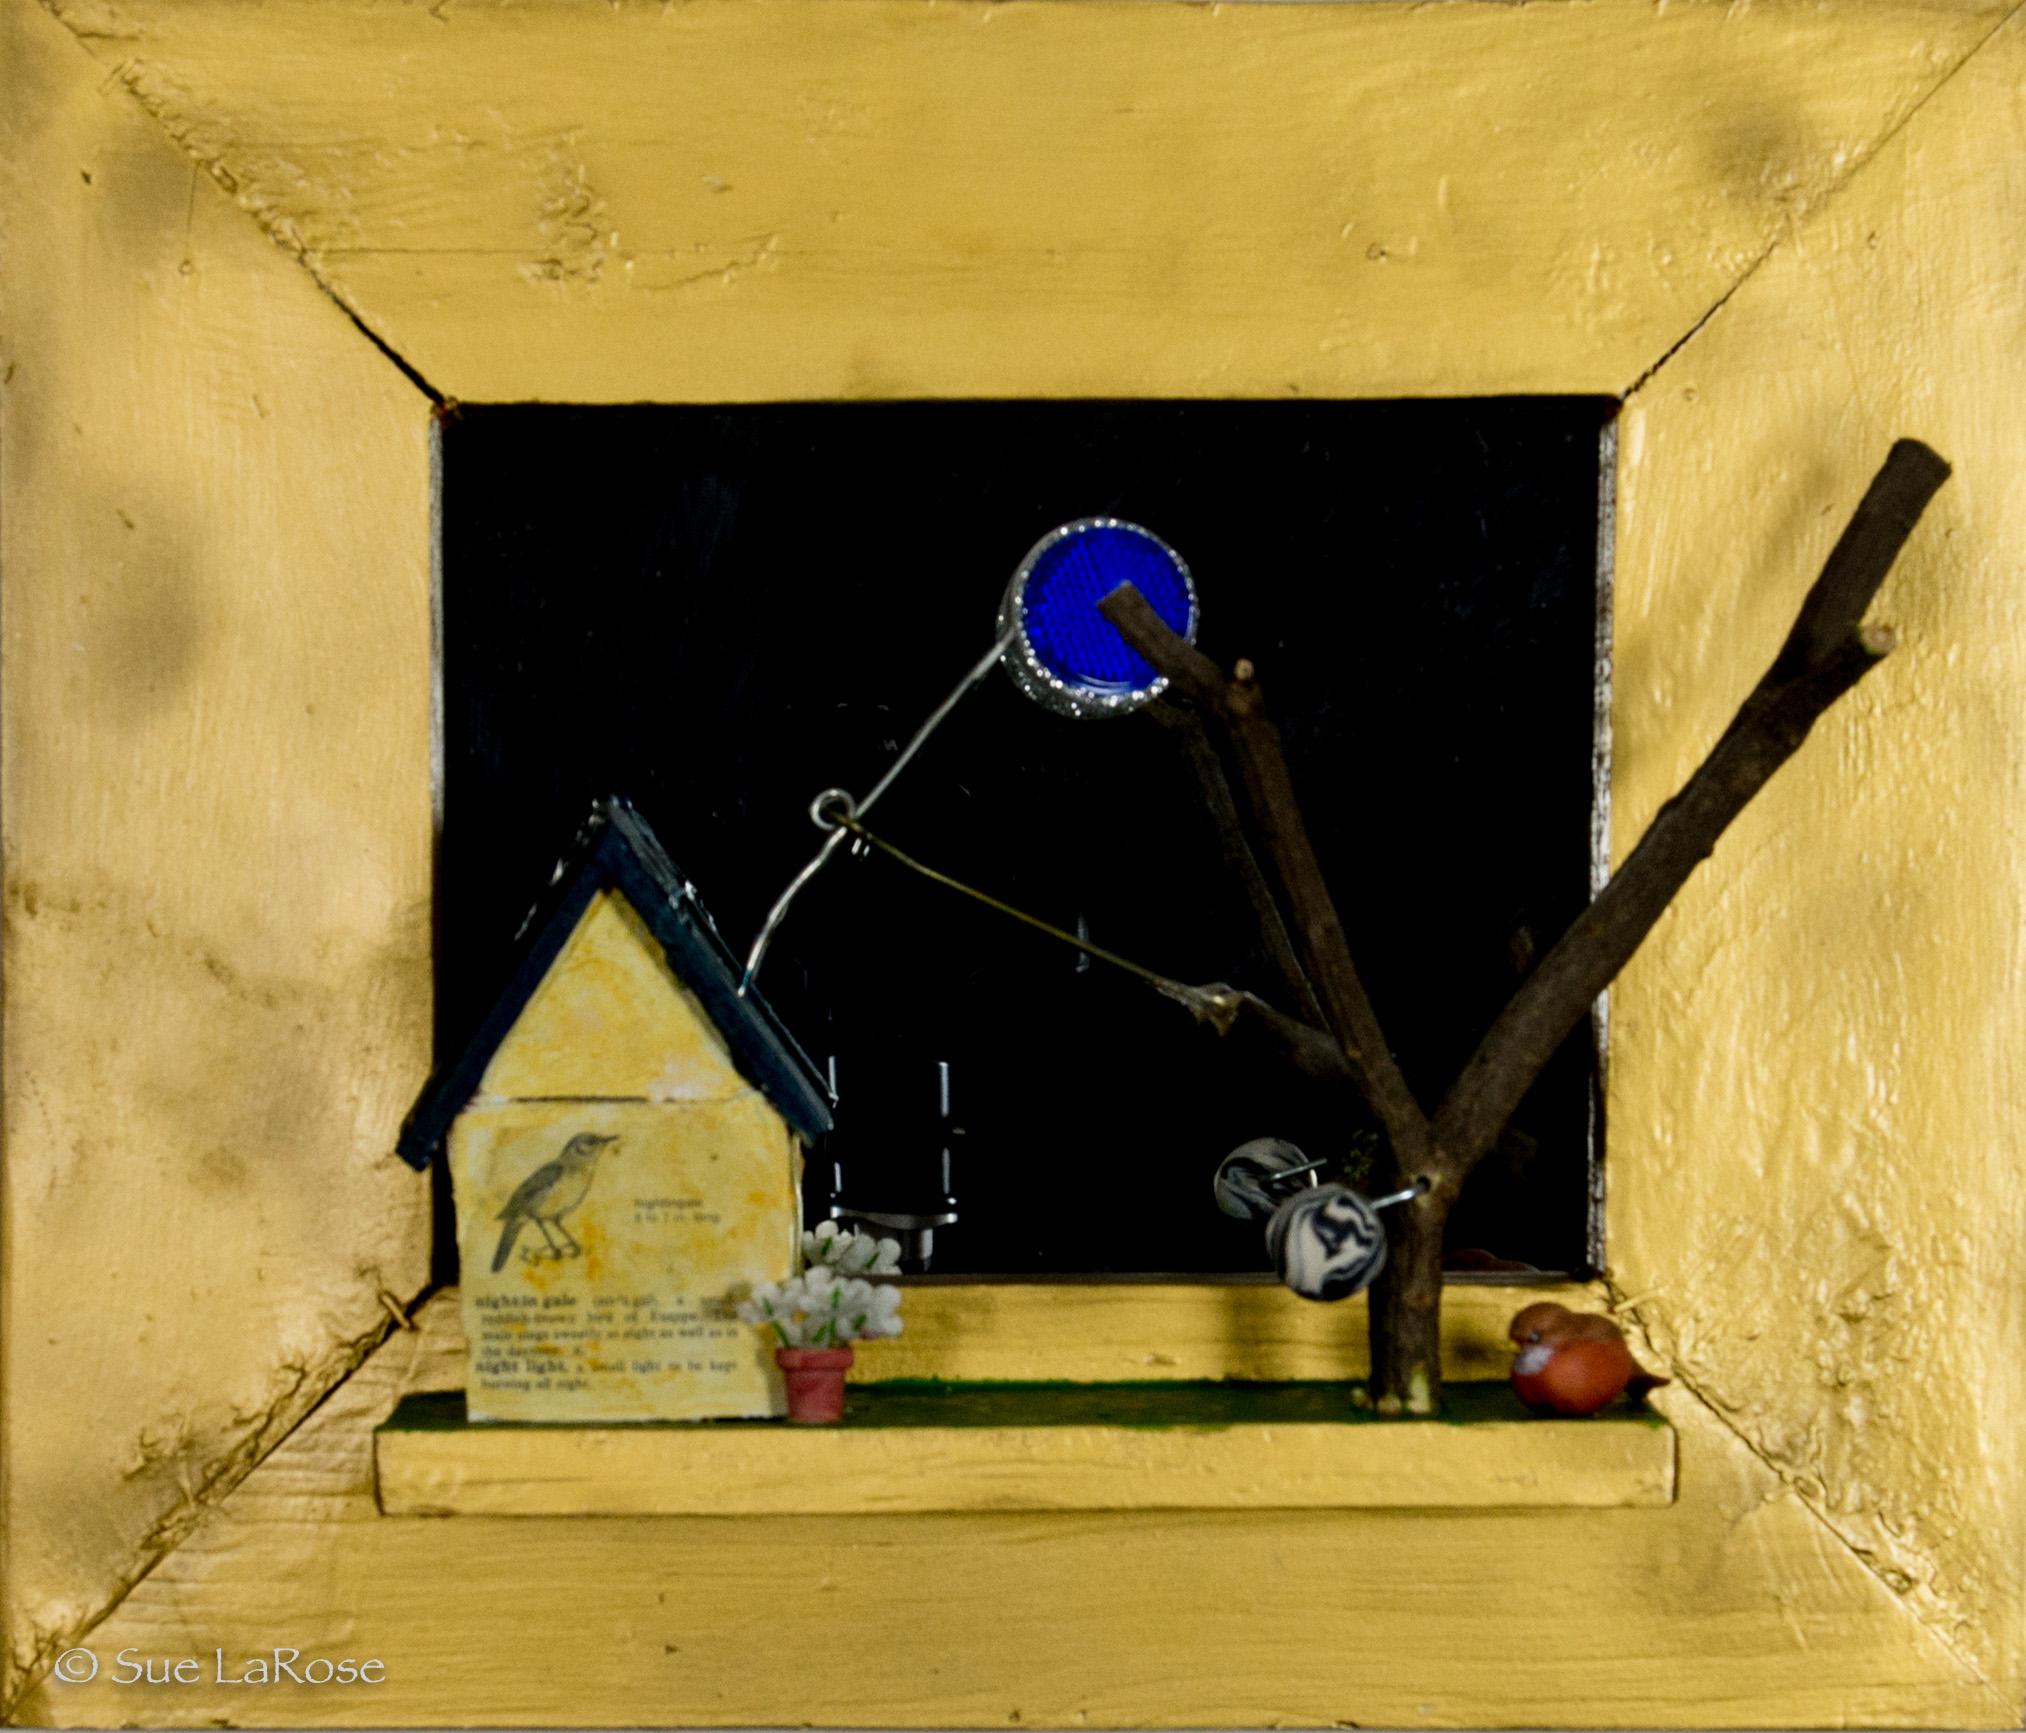 BLUE MOON RISING, 14x17x5, mixed mediaby Stephen & Bev Glueckert -